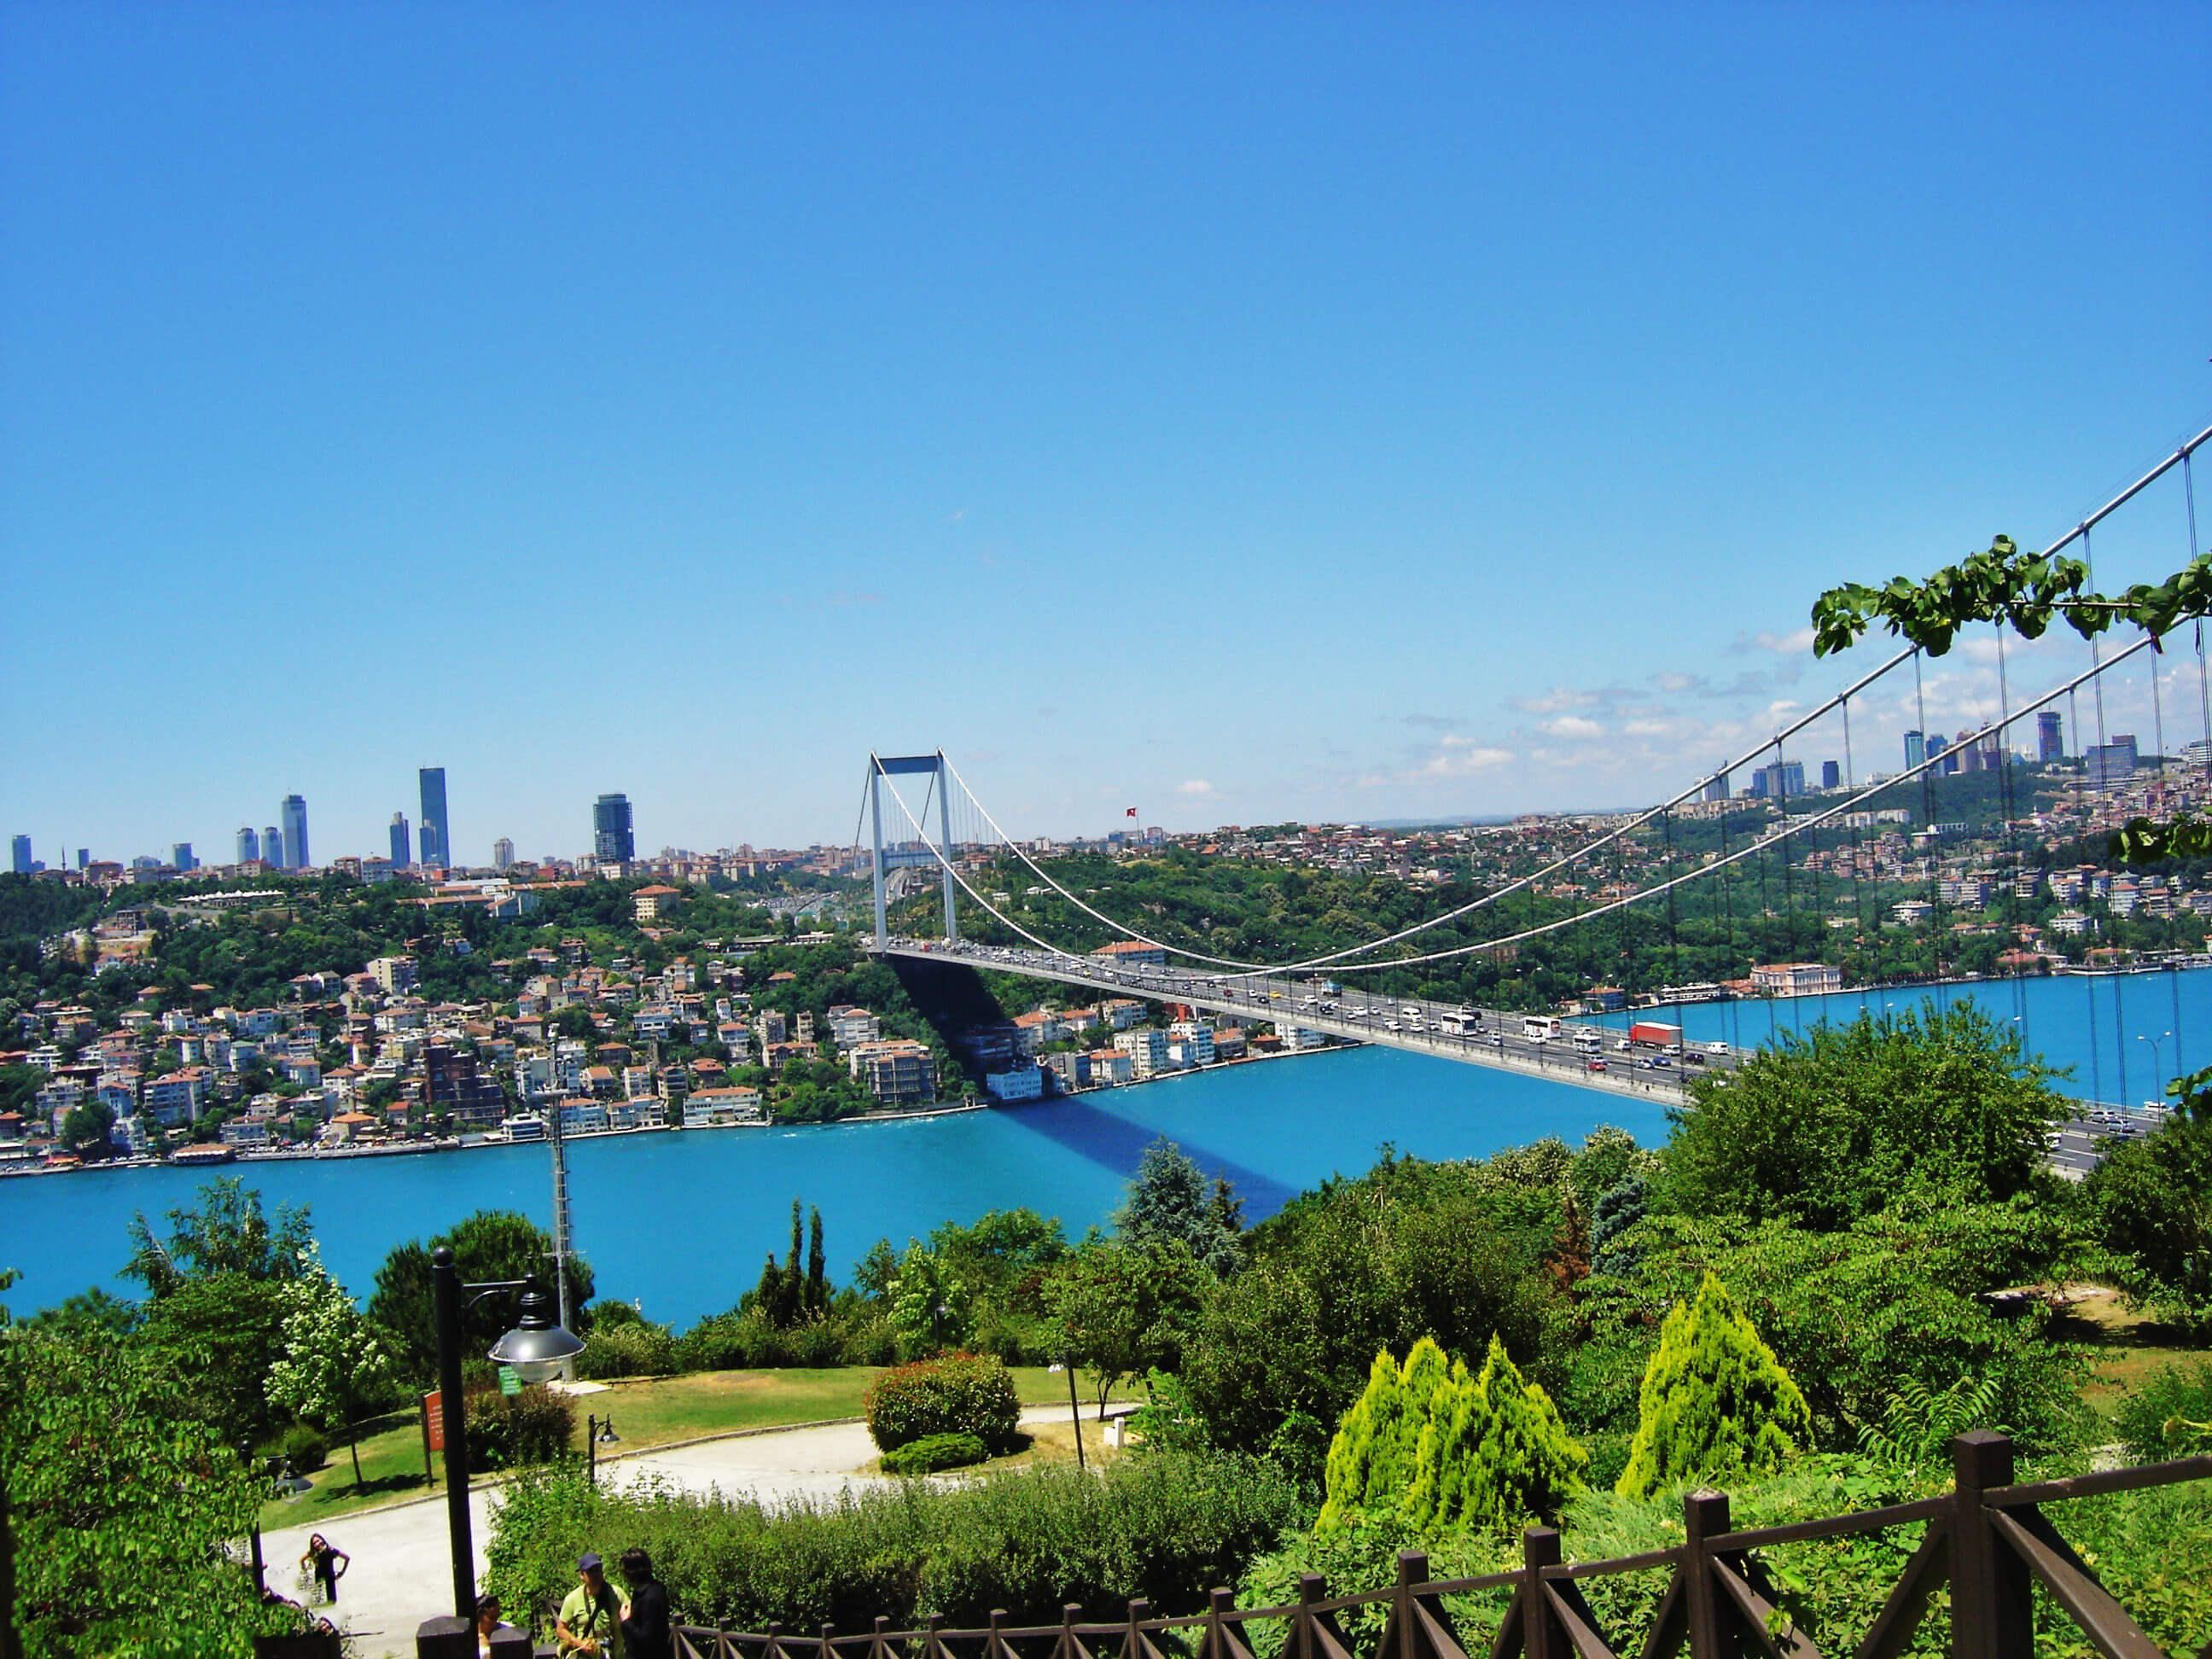 A Unique Scenery: Camlica Hill | Panoramic Bosphorus View